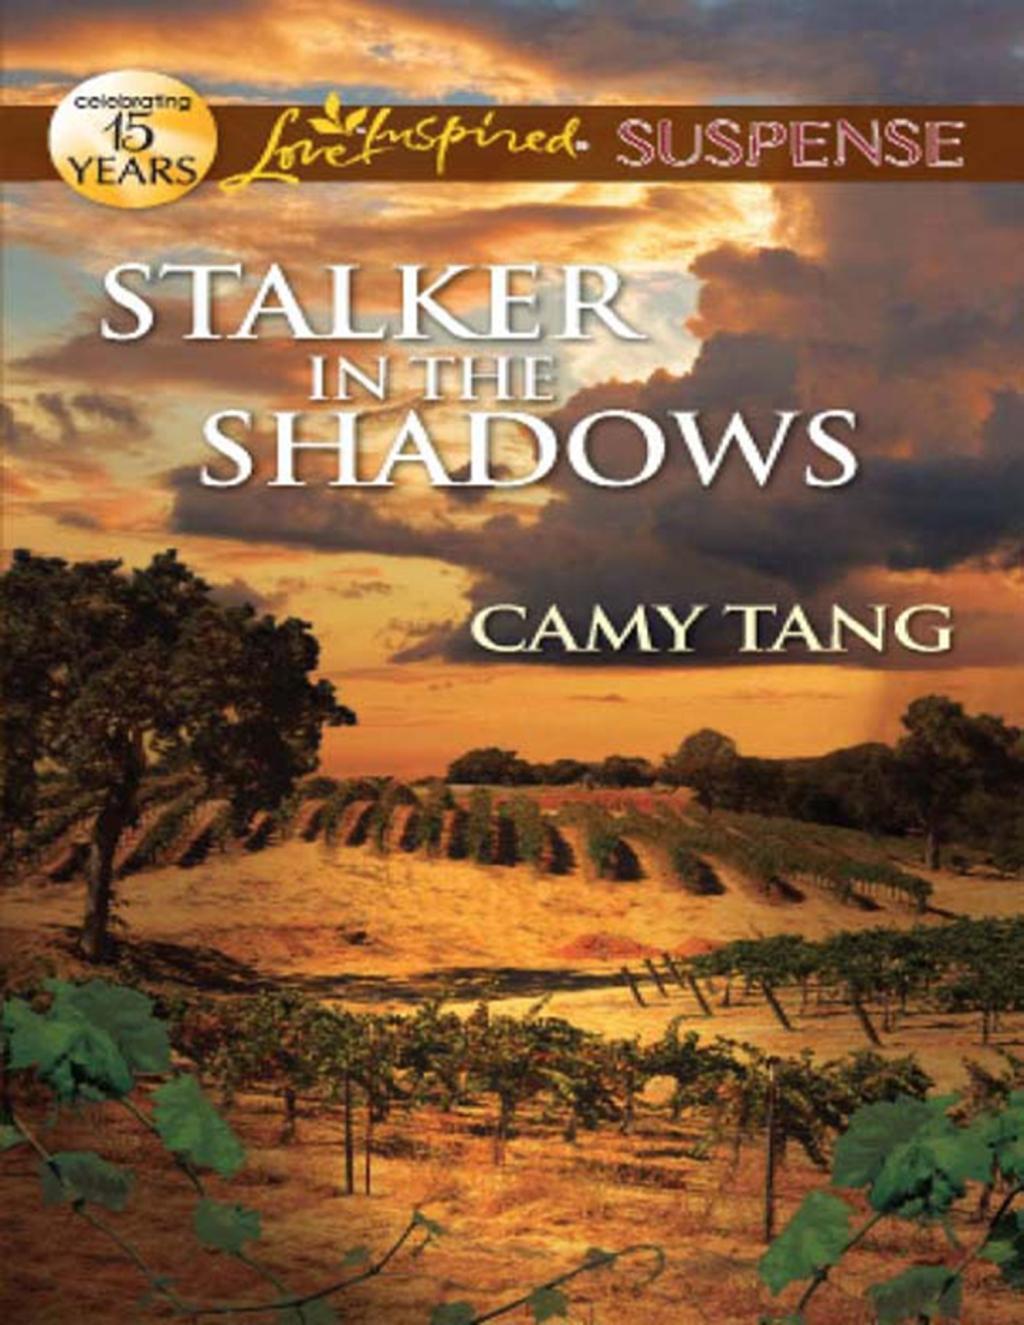 Stalker in the Shadows (Mills & Boon Love Inspired Suspense)